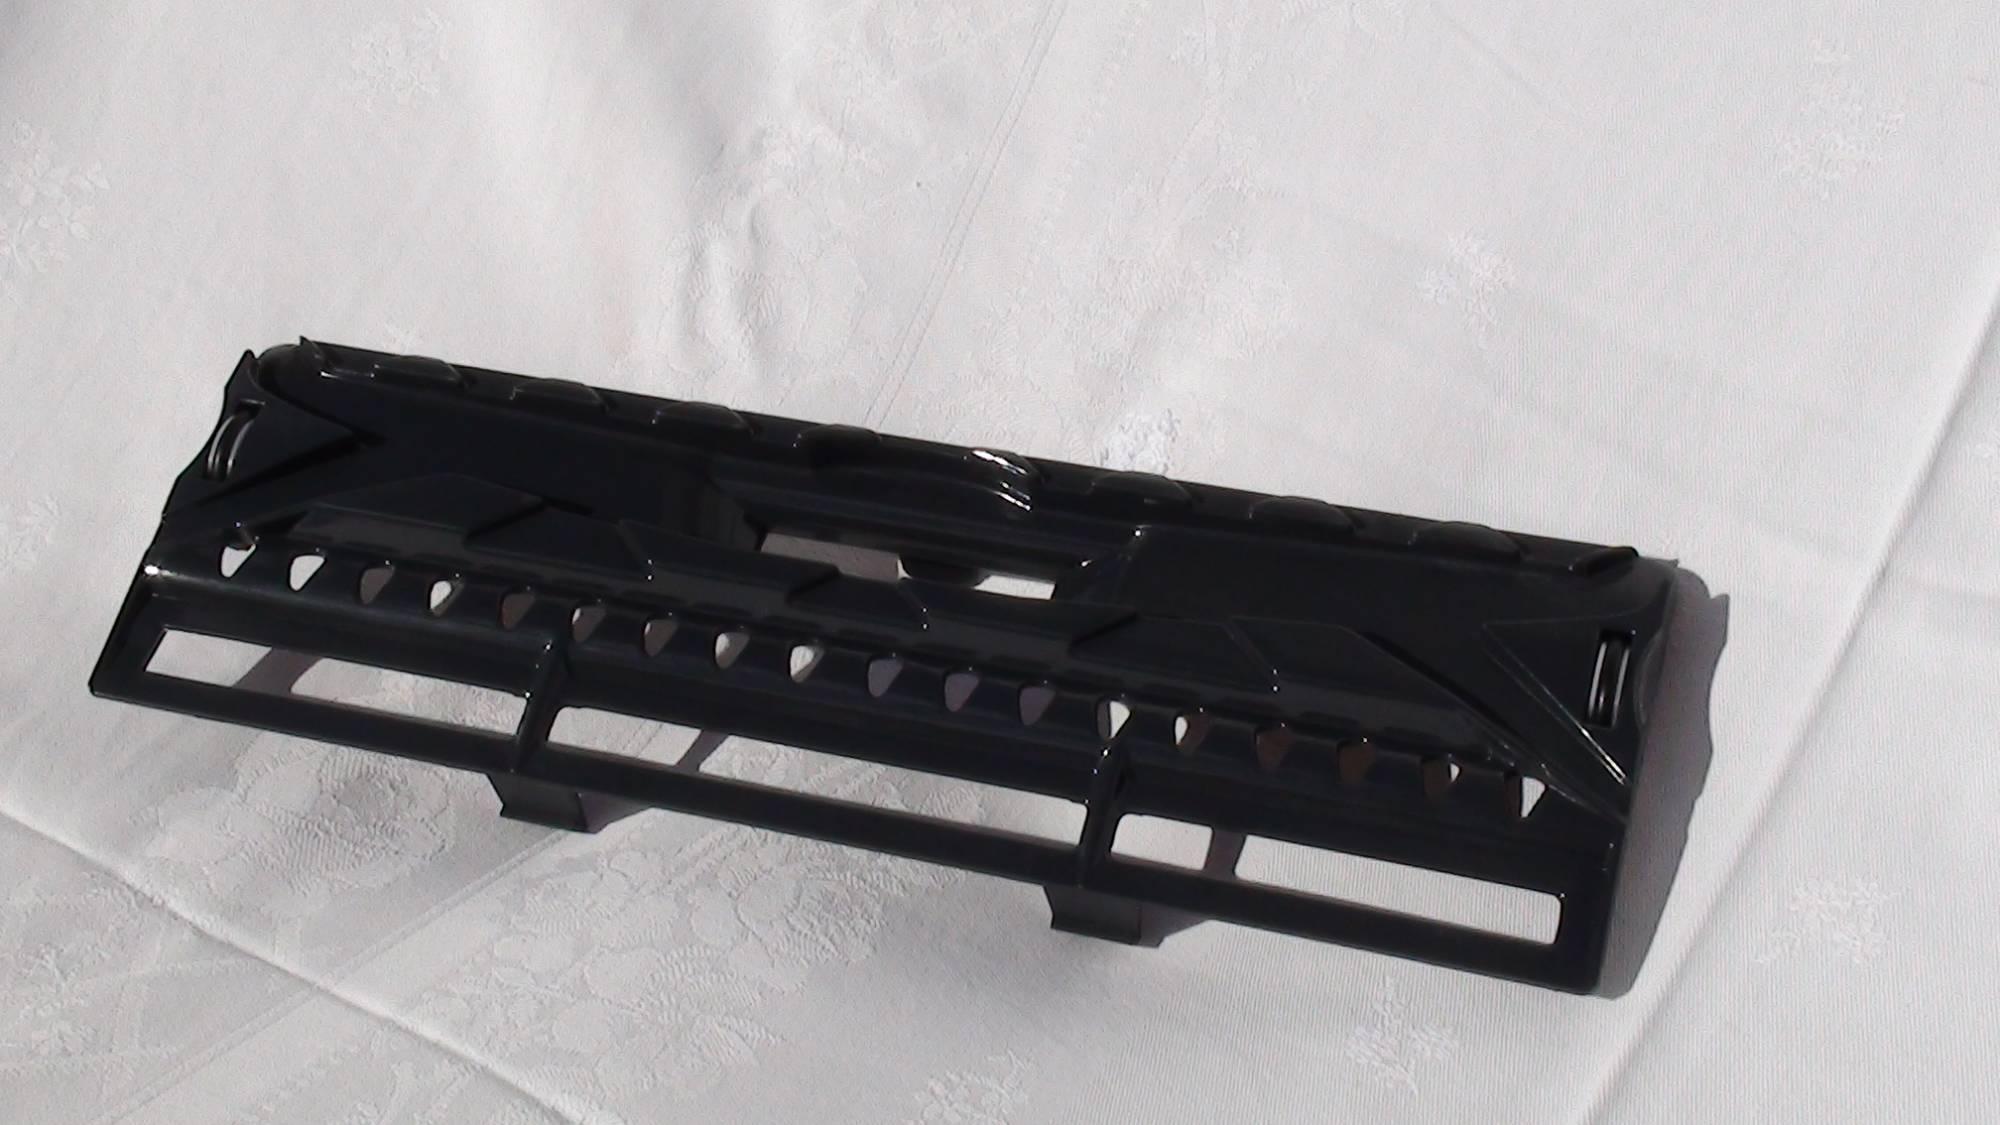 support lisse pour grande brosse sol 29 cm aspirateur nettoyeur vapeur spooty. Black Bedroom Furniture Sets. Home Design Ideas